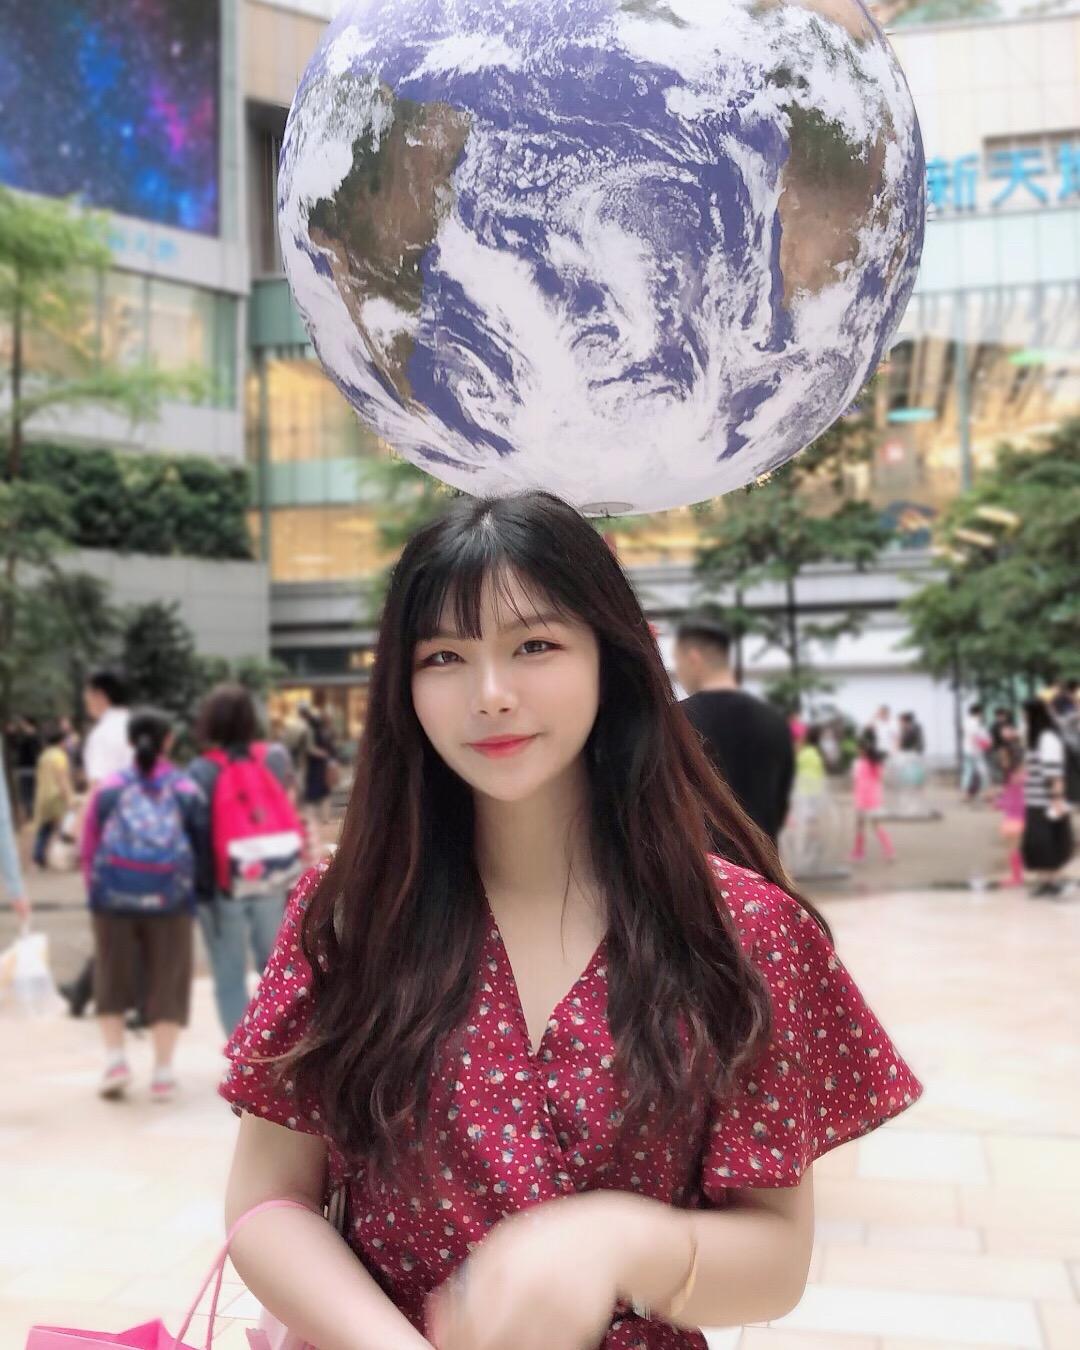 ANNA FONG - June 17th, 2019 to August 31st, 2019Nationality: Hong KongHong Kong Polytechnic University